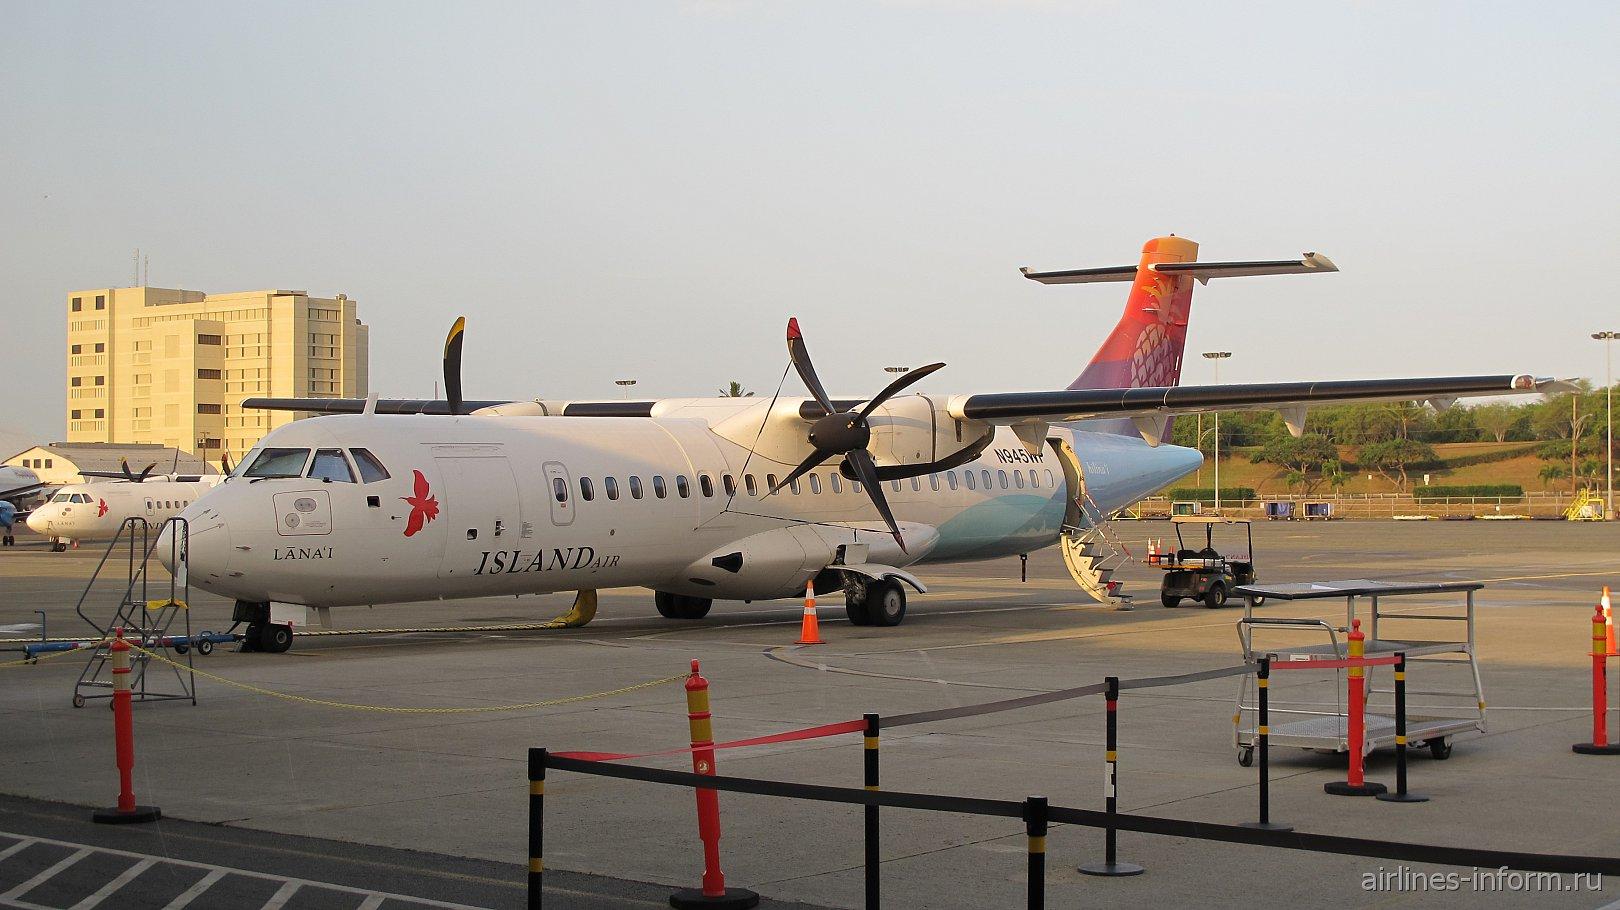 Самолет ATR 72 авиакомпании Island Air в аэропорту Гонолулу